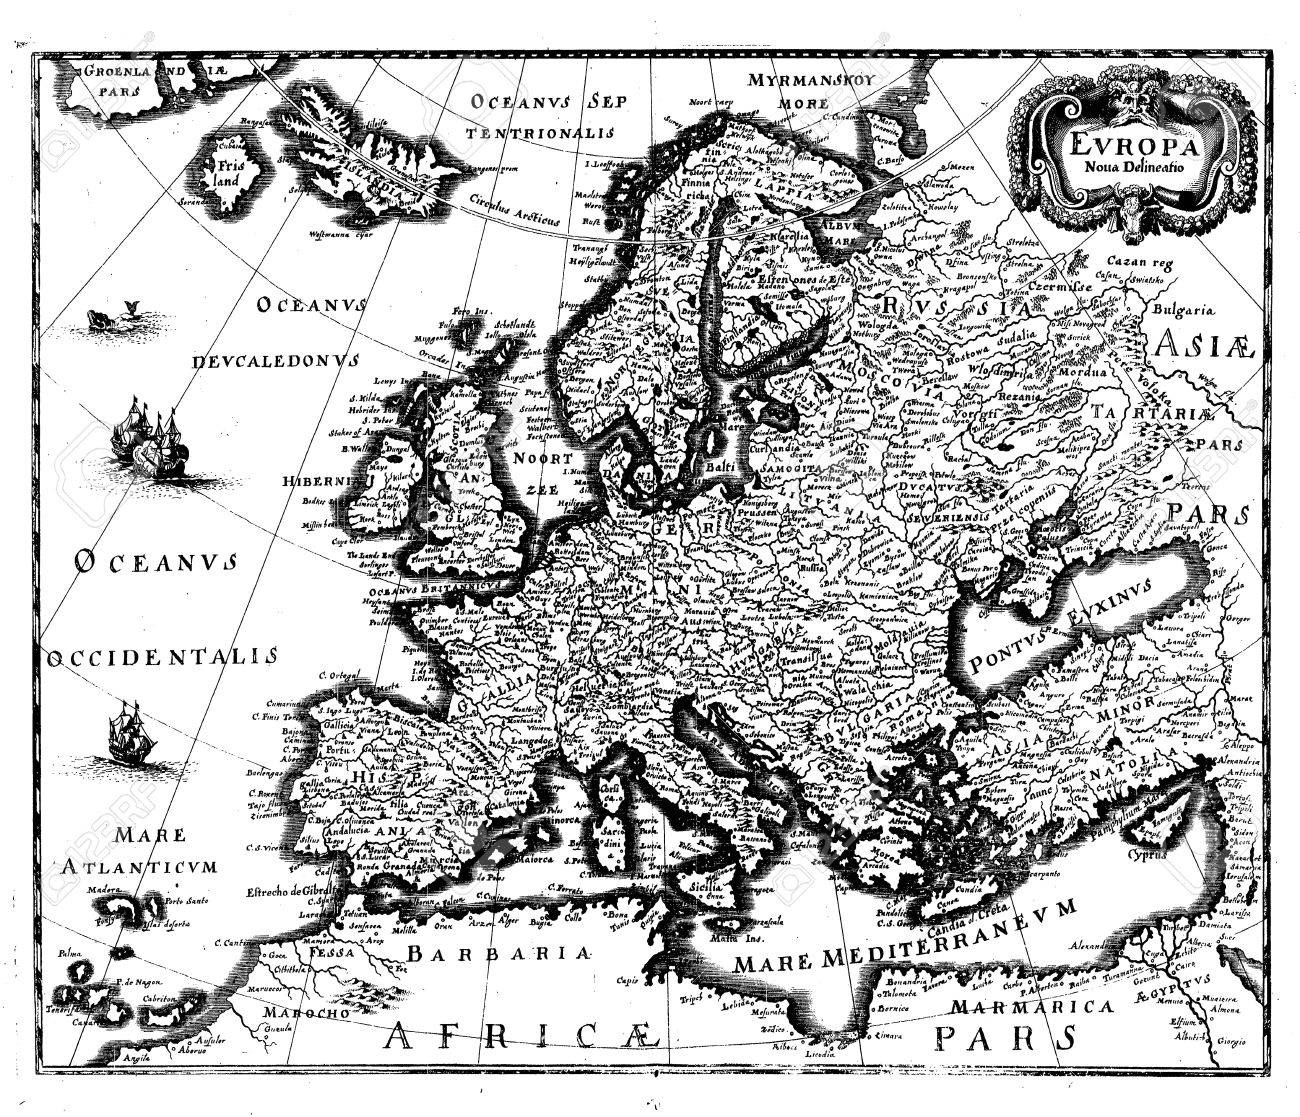 Frankfurt Karte Europa.Stock Photo